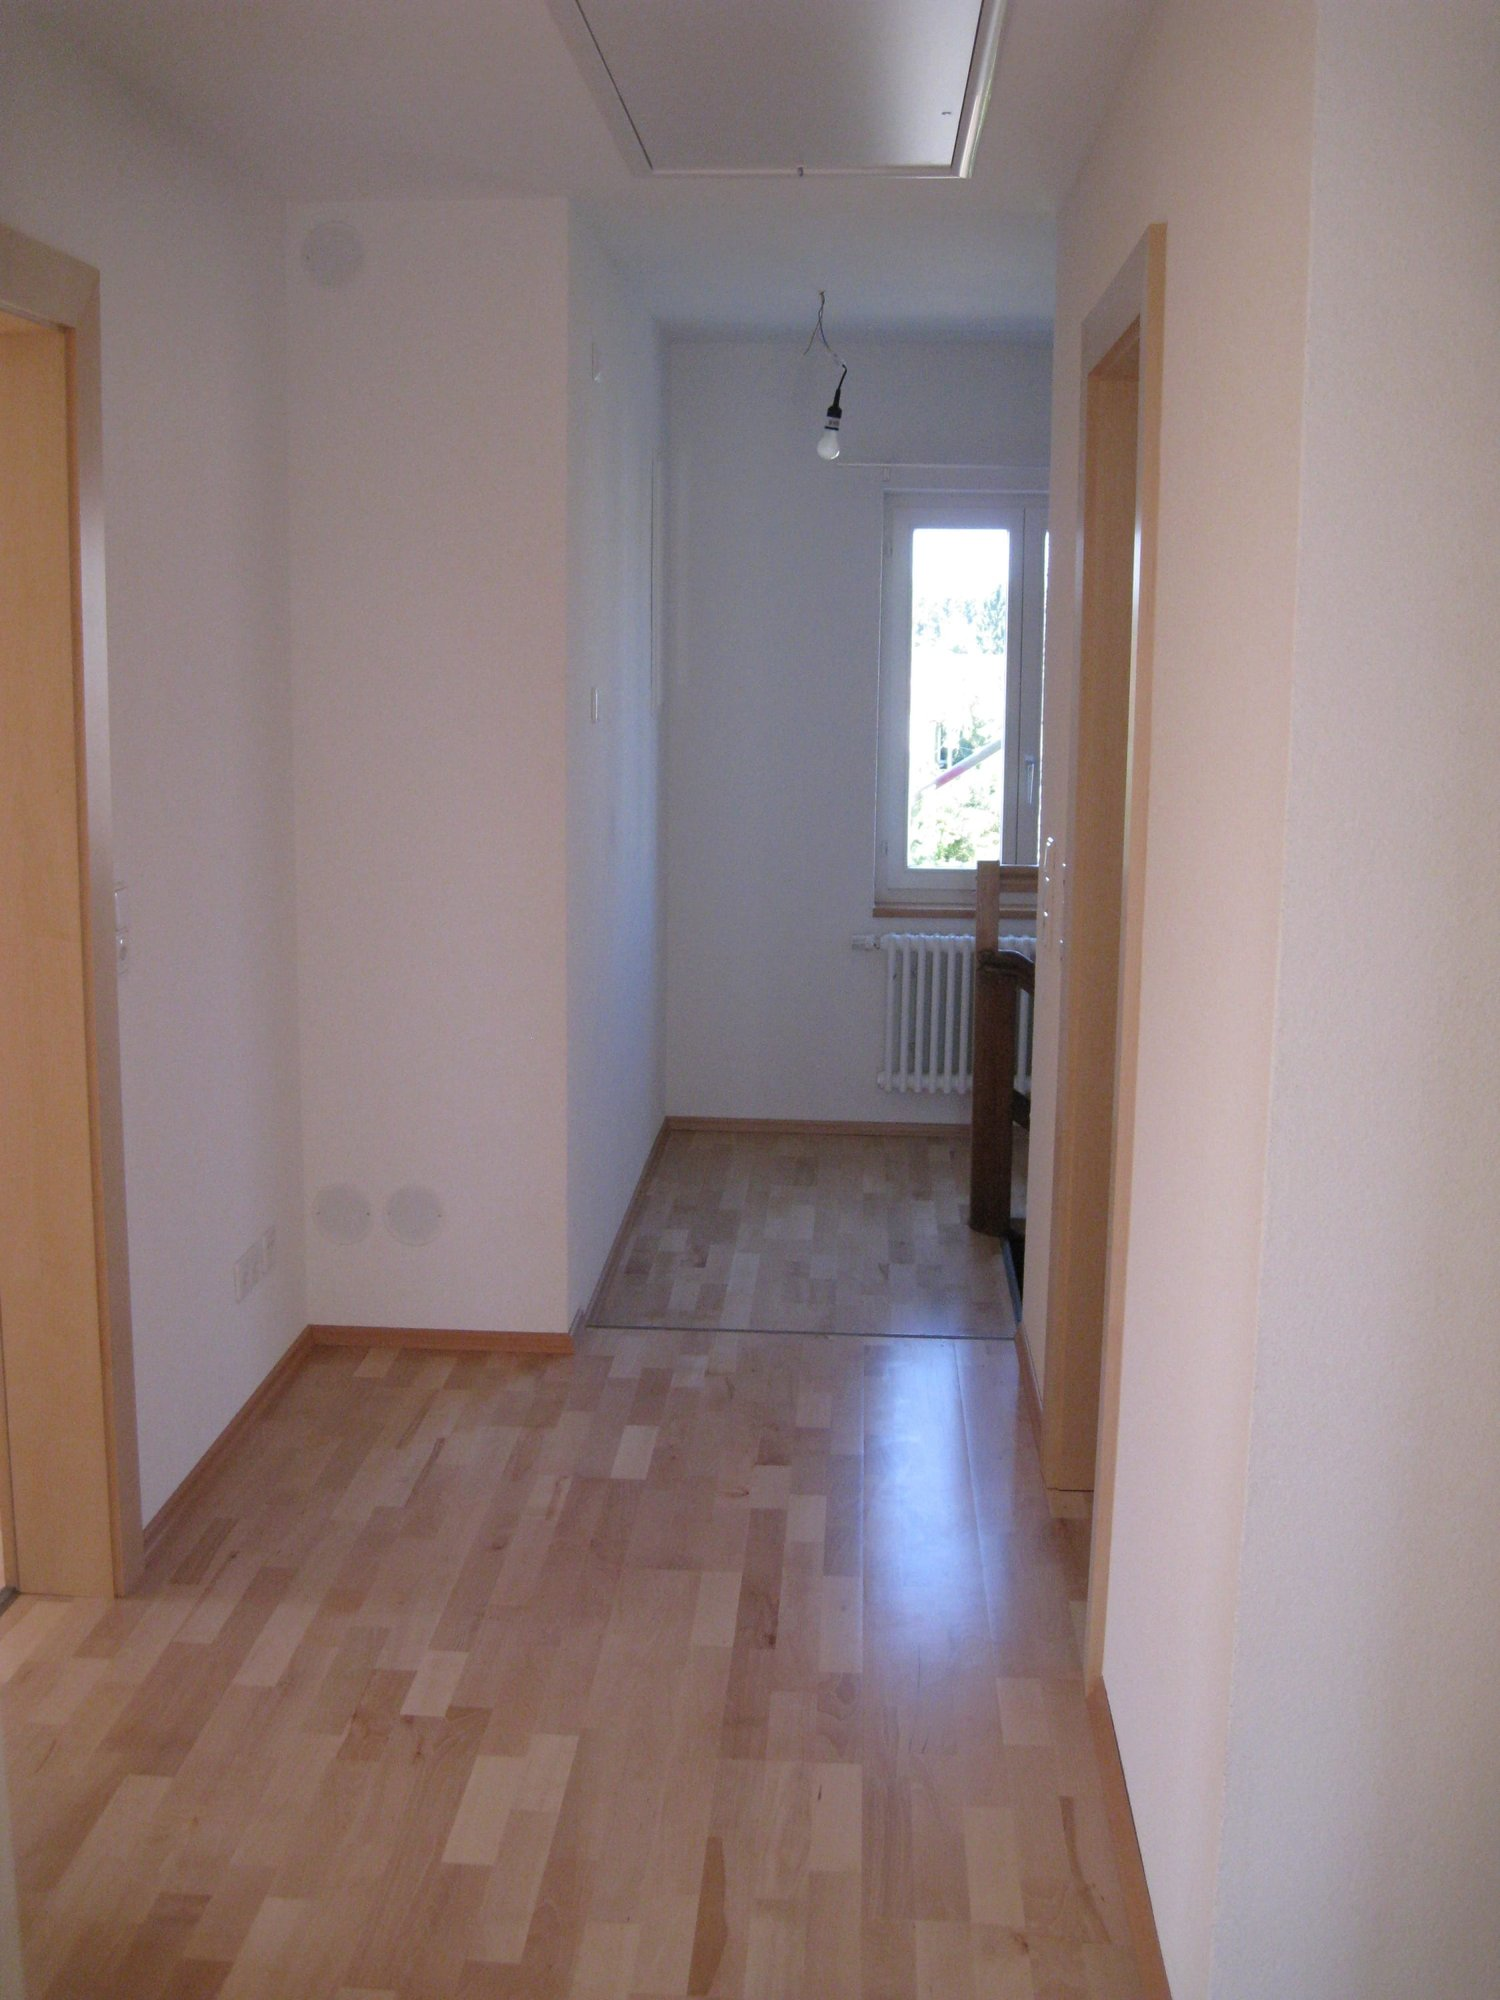 Wolfensbergstrasse 23